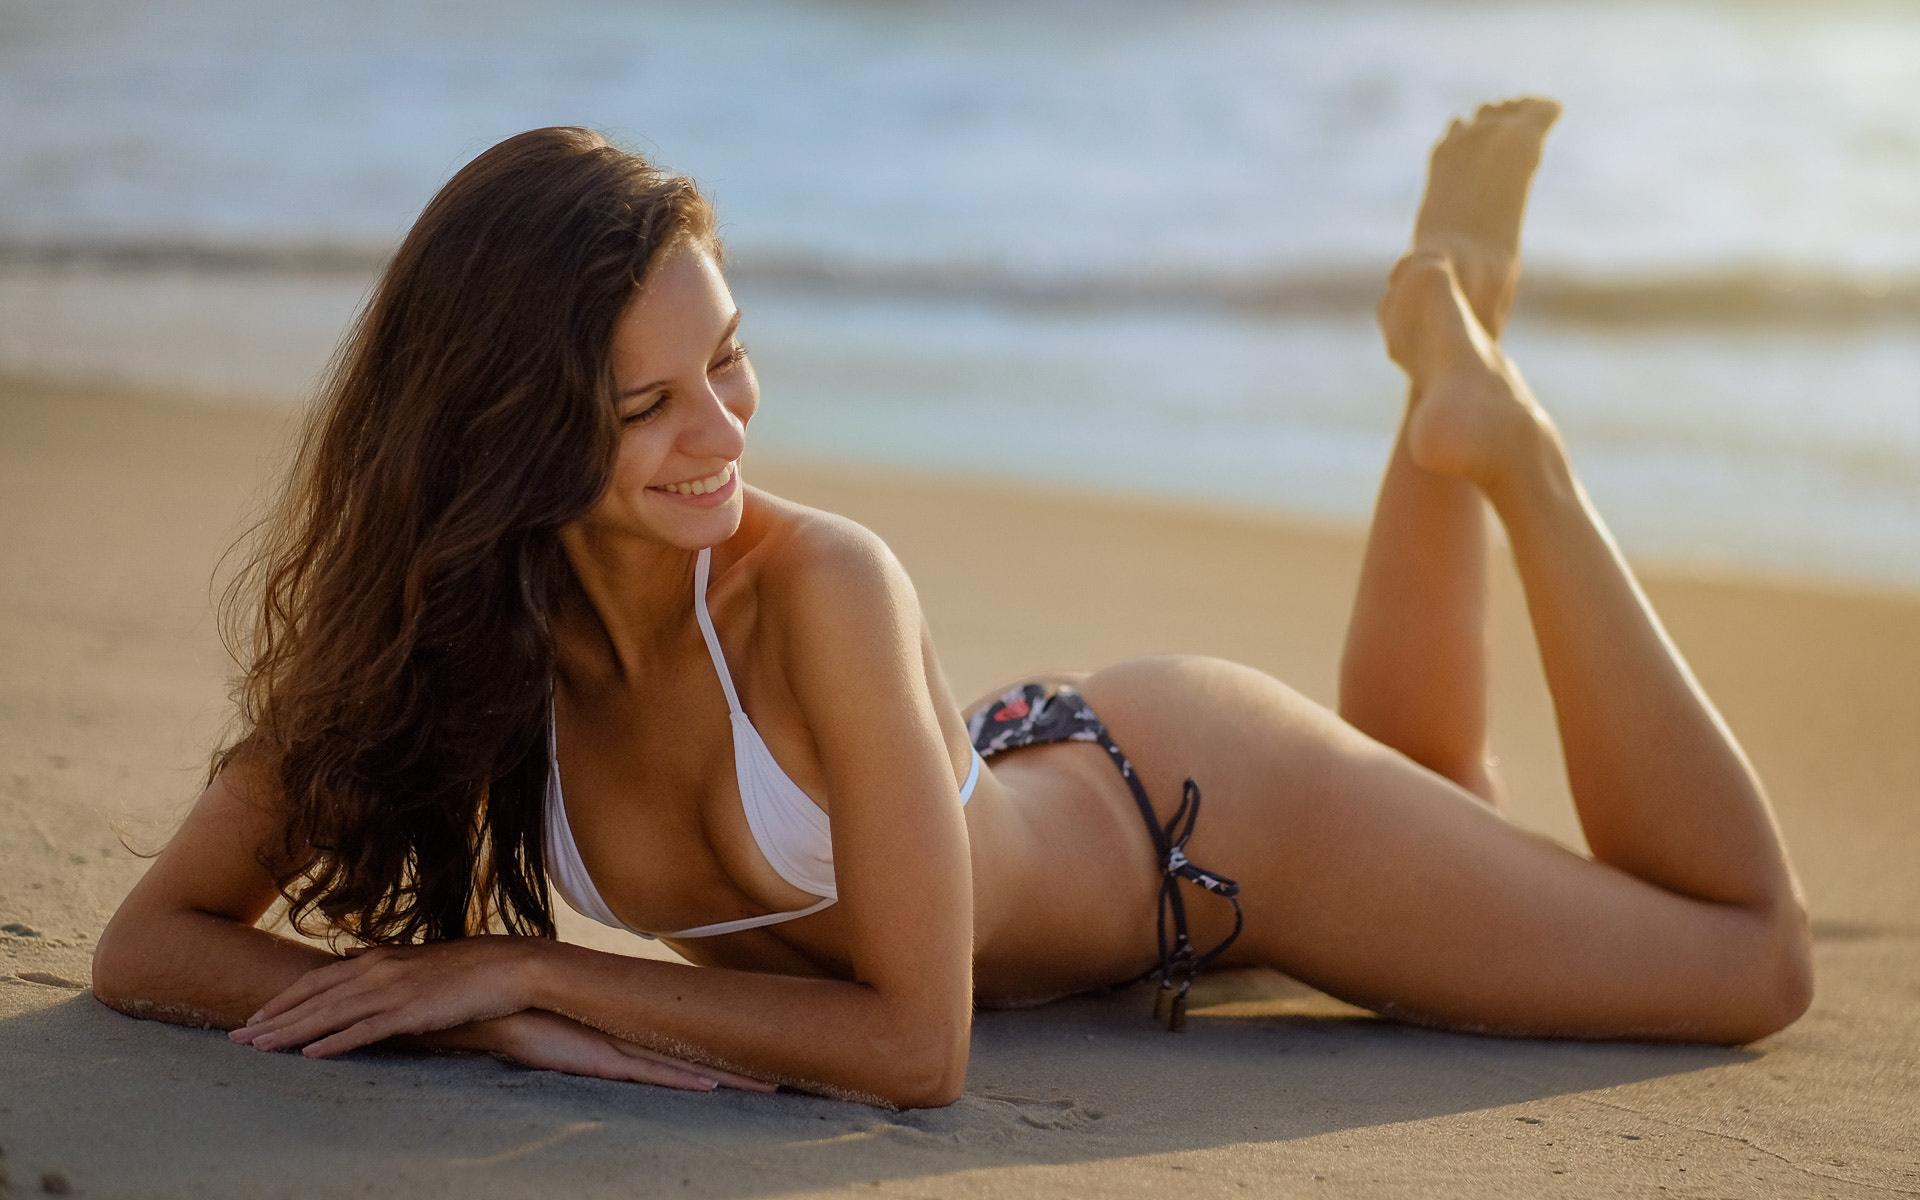 sexy-babes-nude-sunbathing-holly-halston-interracial-tube